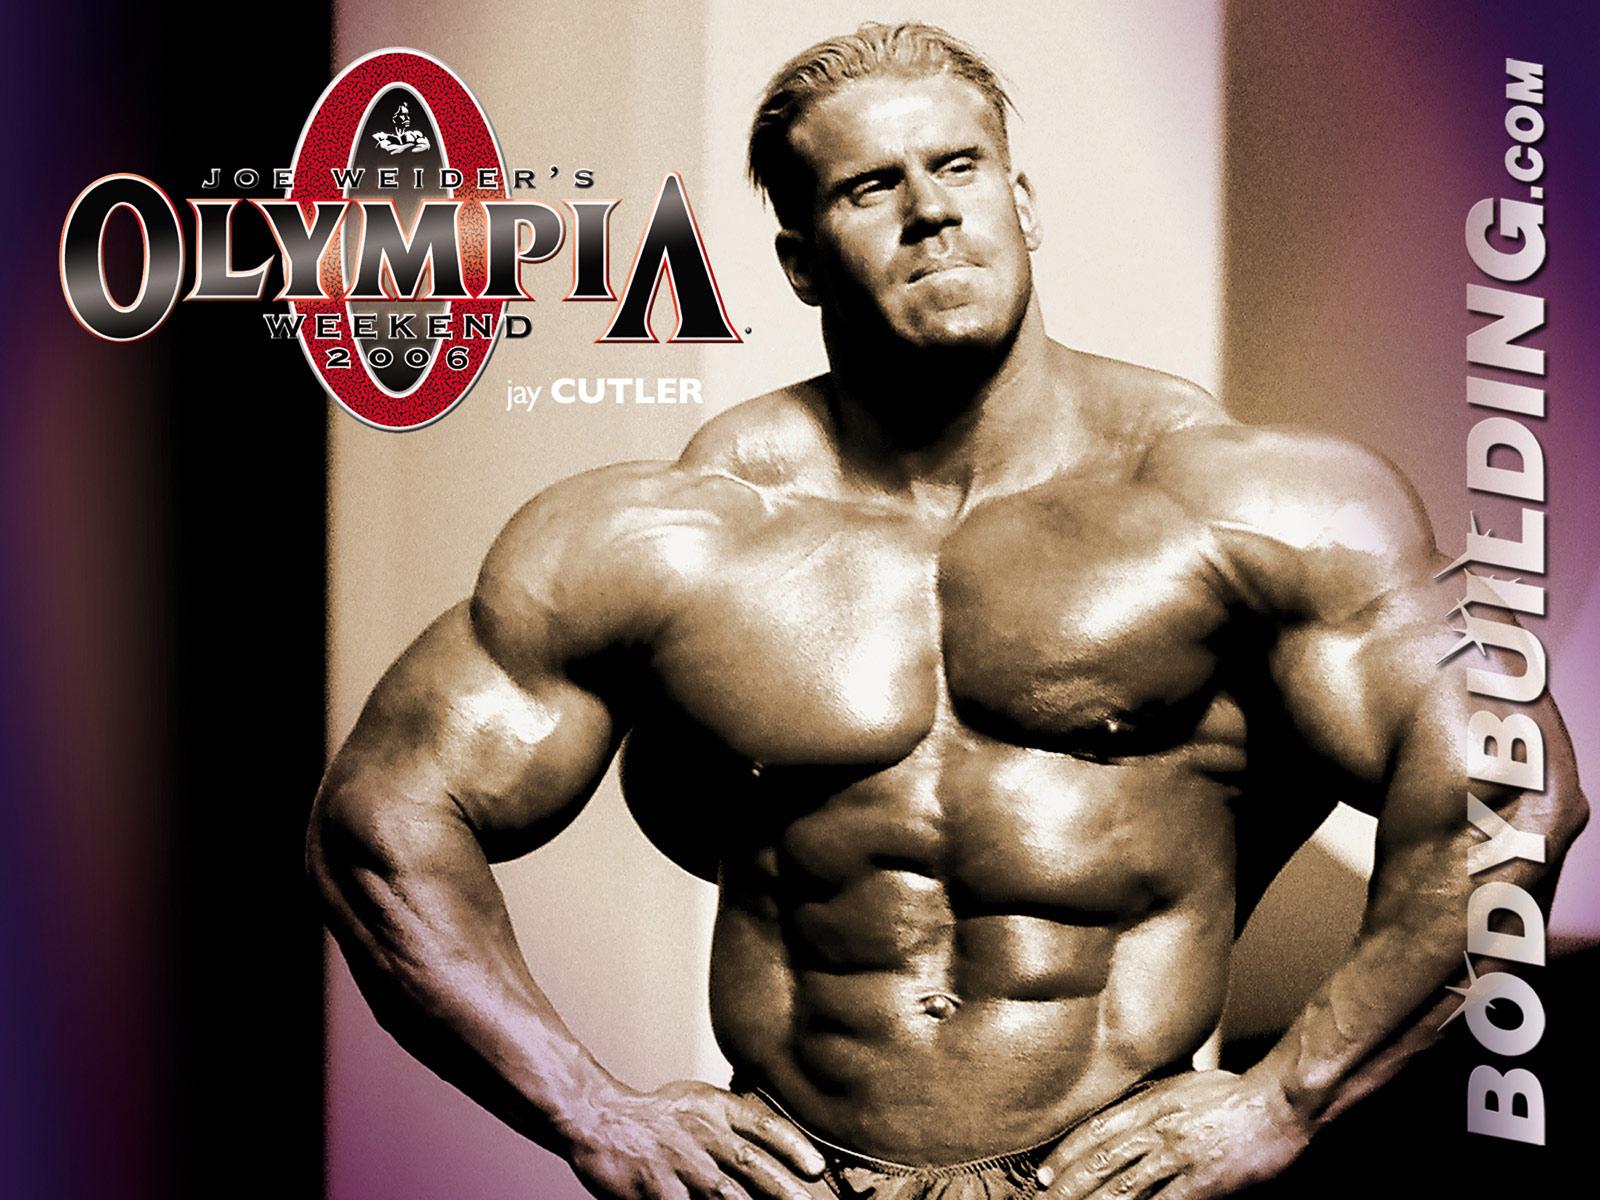 http://2.bp.blogspot.com/-qGOoaVVbs2w/TxmBhIQ5Z0I/AAAAAAAAJVk/o0OpBBrAxWM/s1600/jay_cutler252c_2006_mr-_olympia252c_bodybuilding.jpg